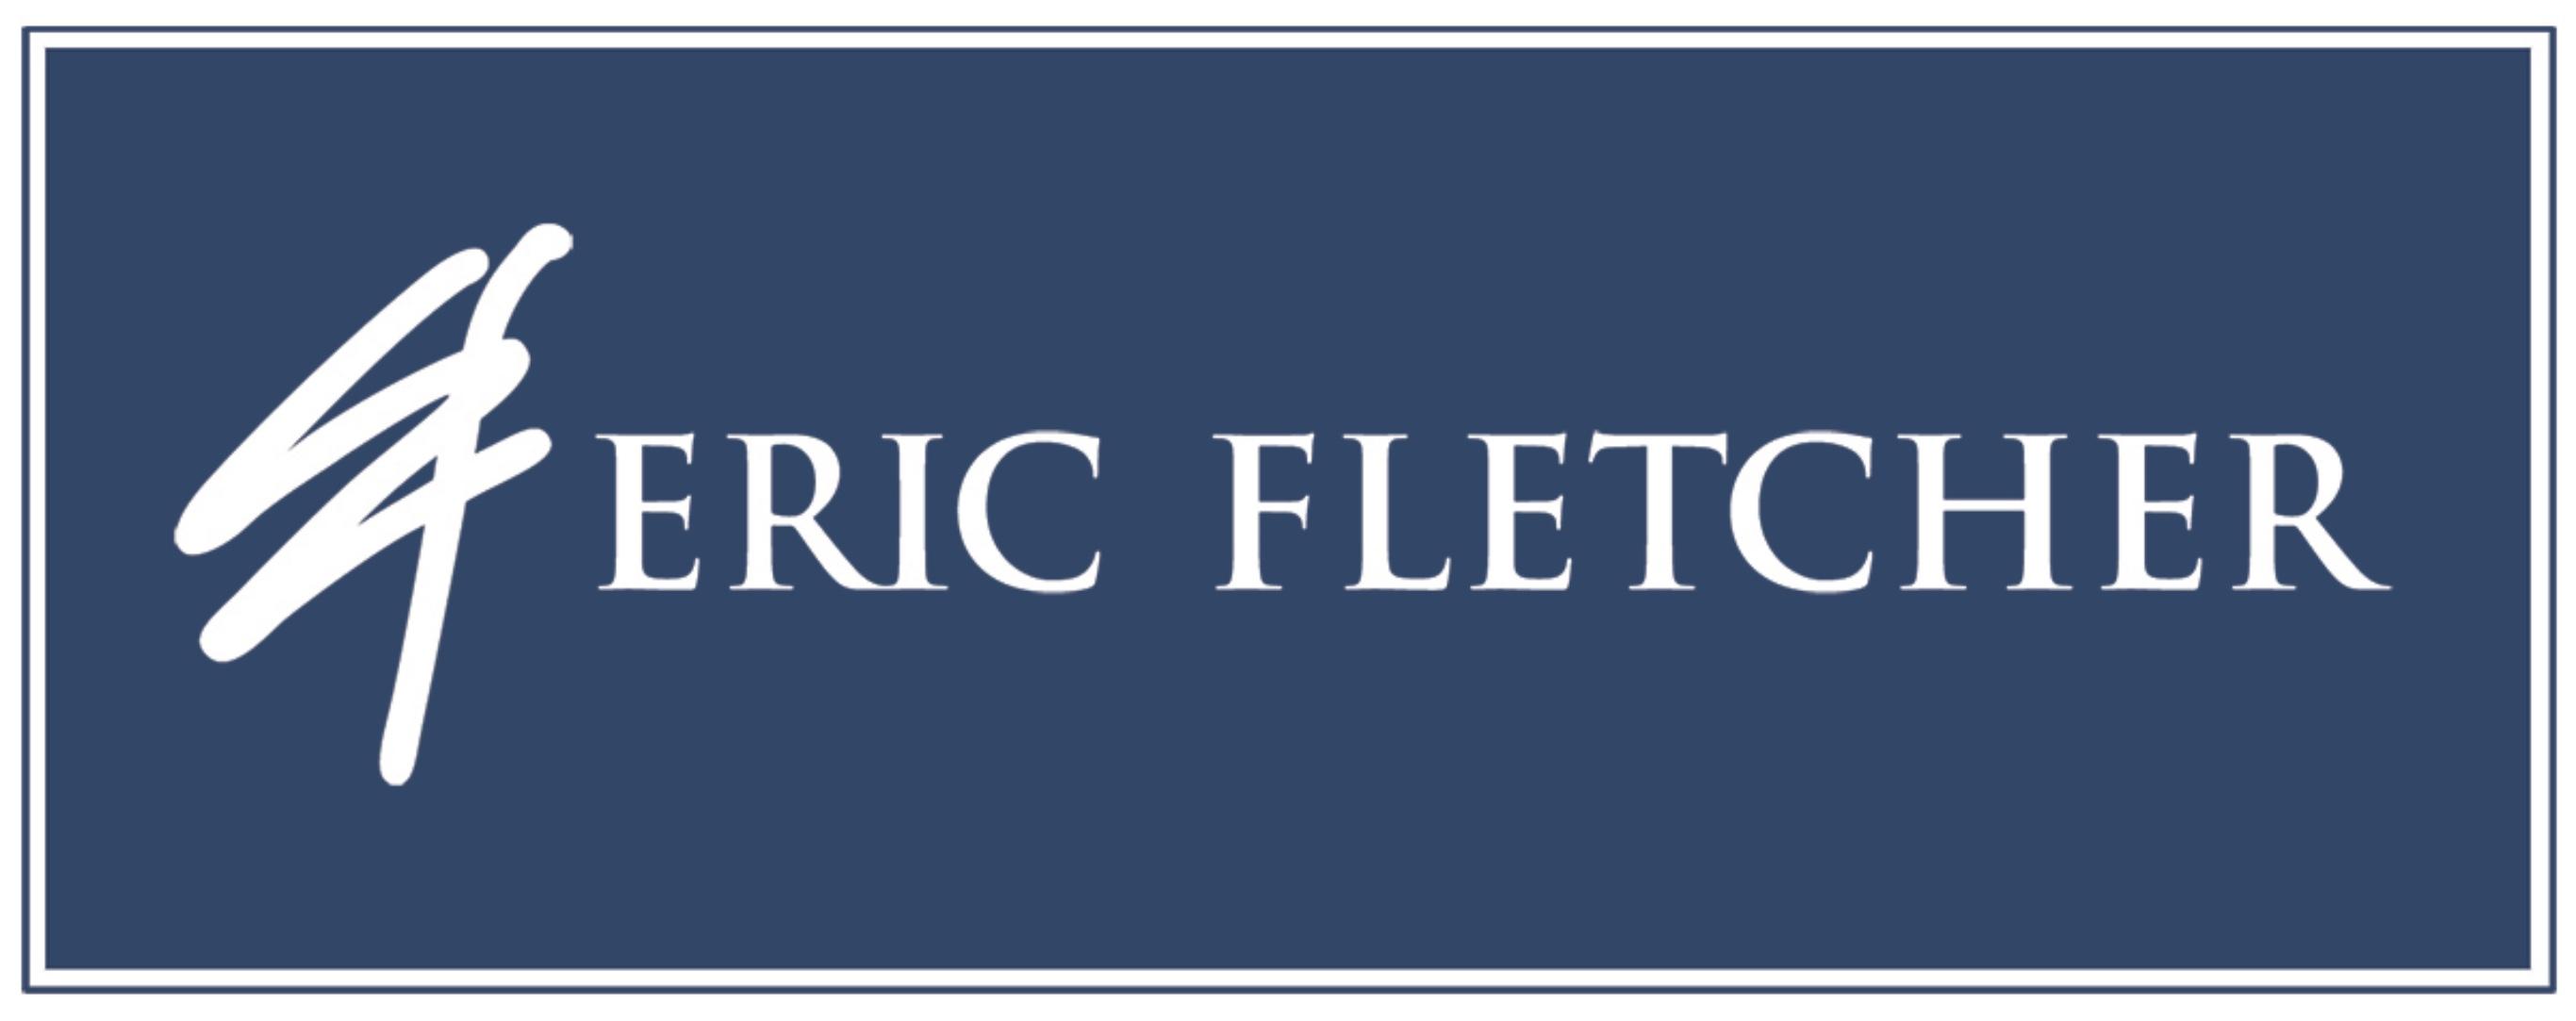 Eric Fletcher Consulting